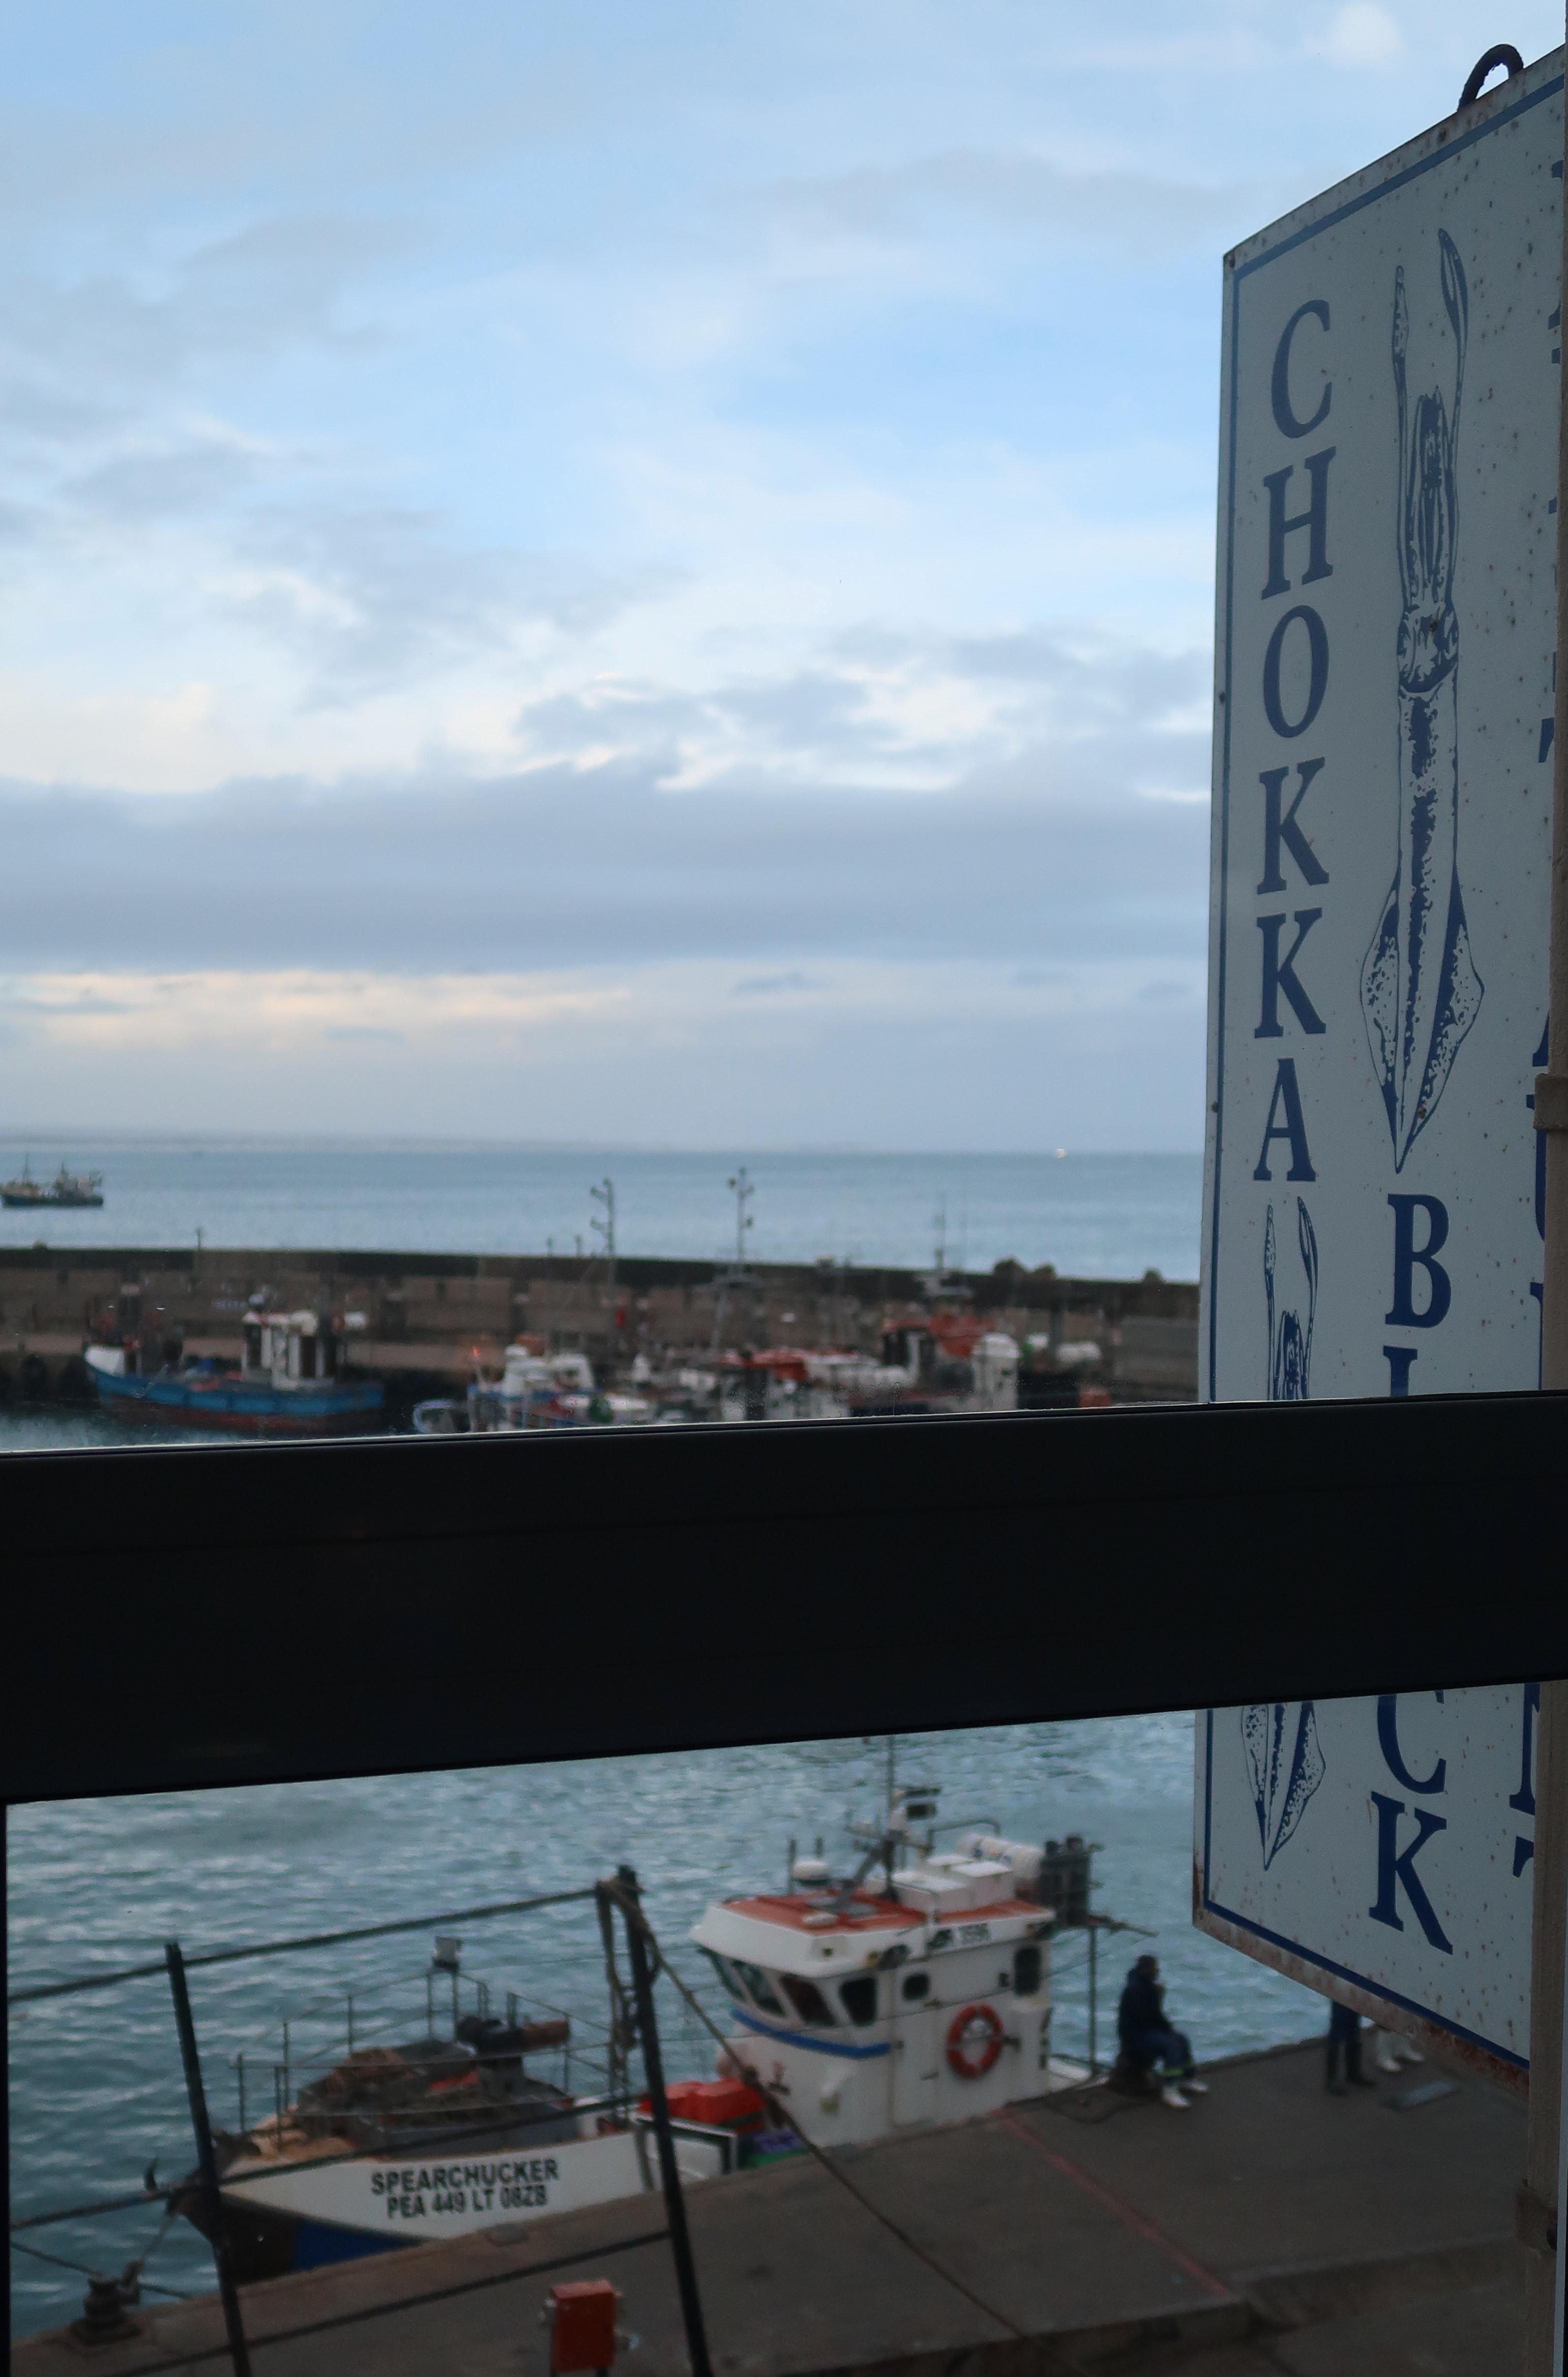 Chokka Block St, Francis Bay